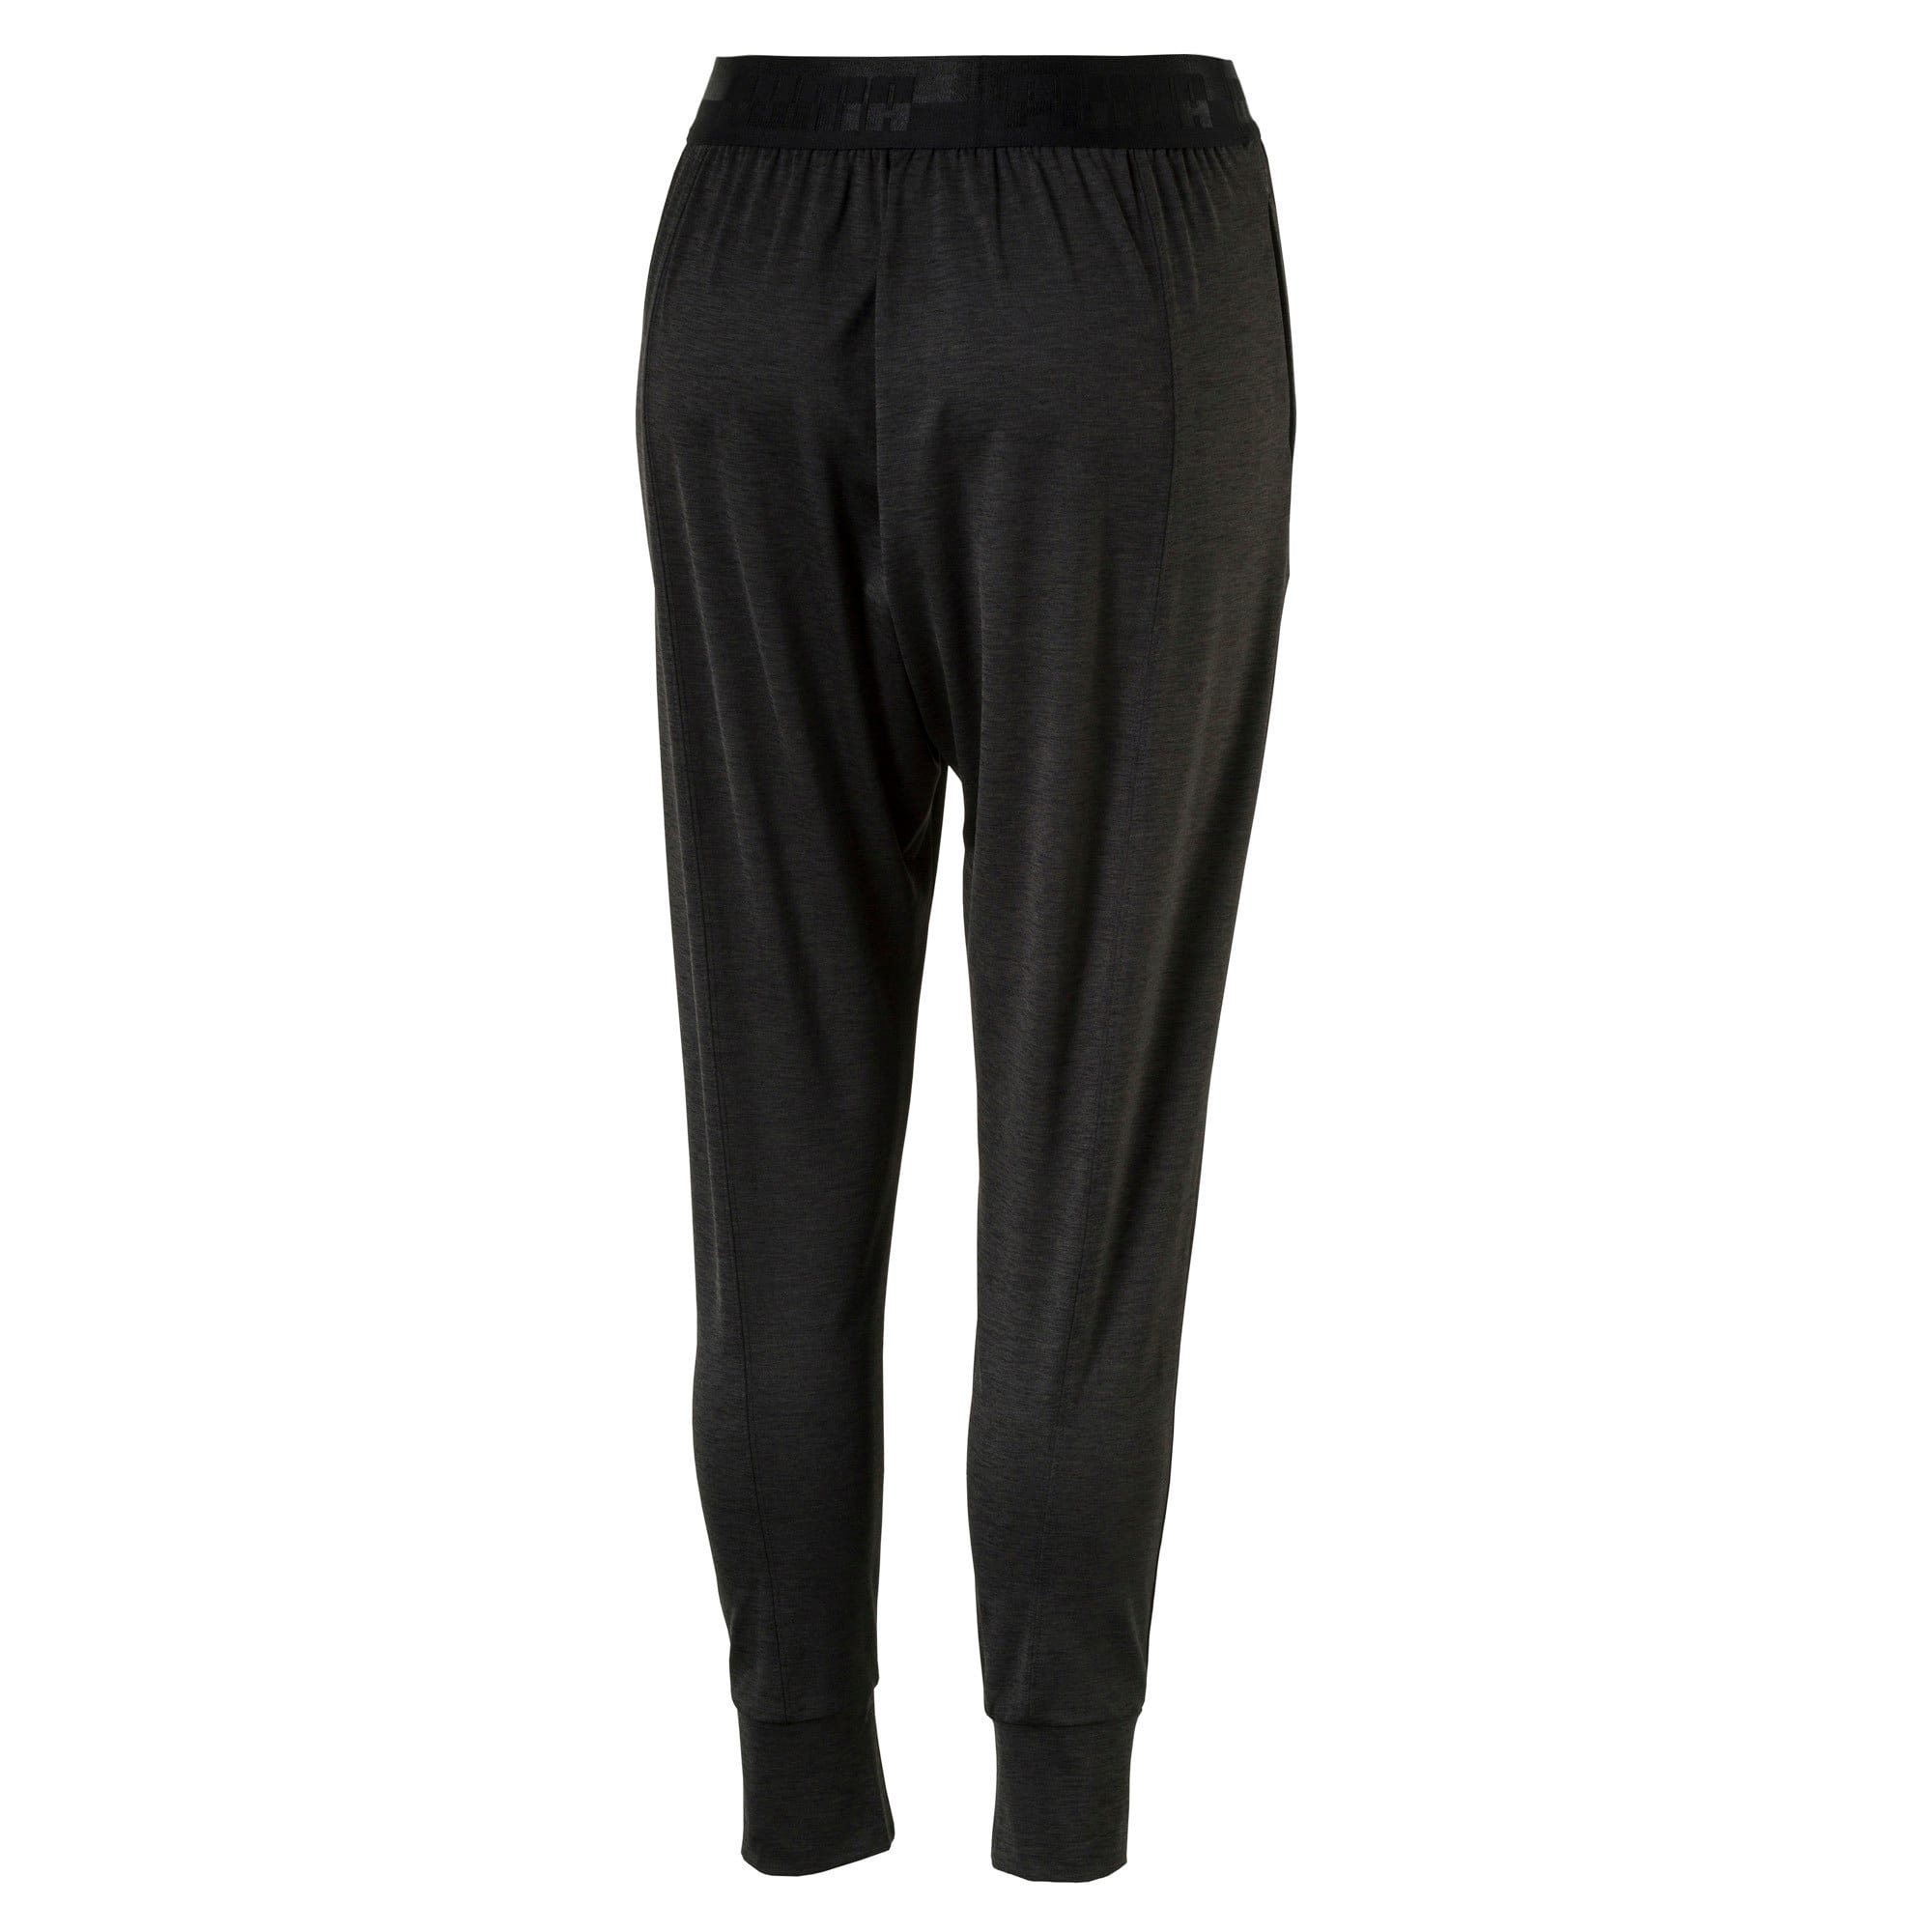 Thumbnail 3 of Soft Sport Women's Sweatpants, Puma Black-heather, medium